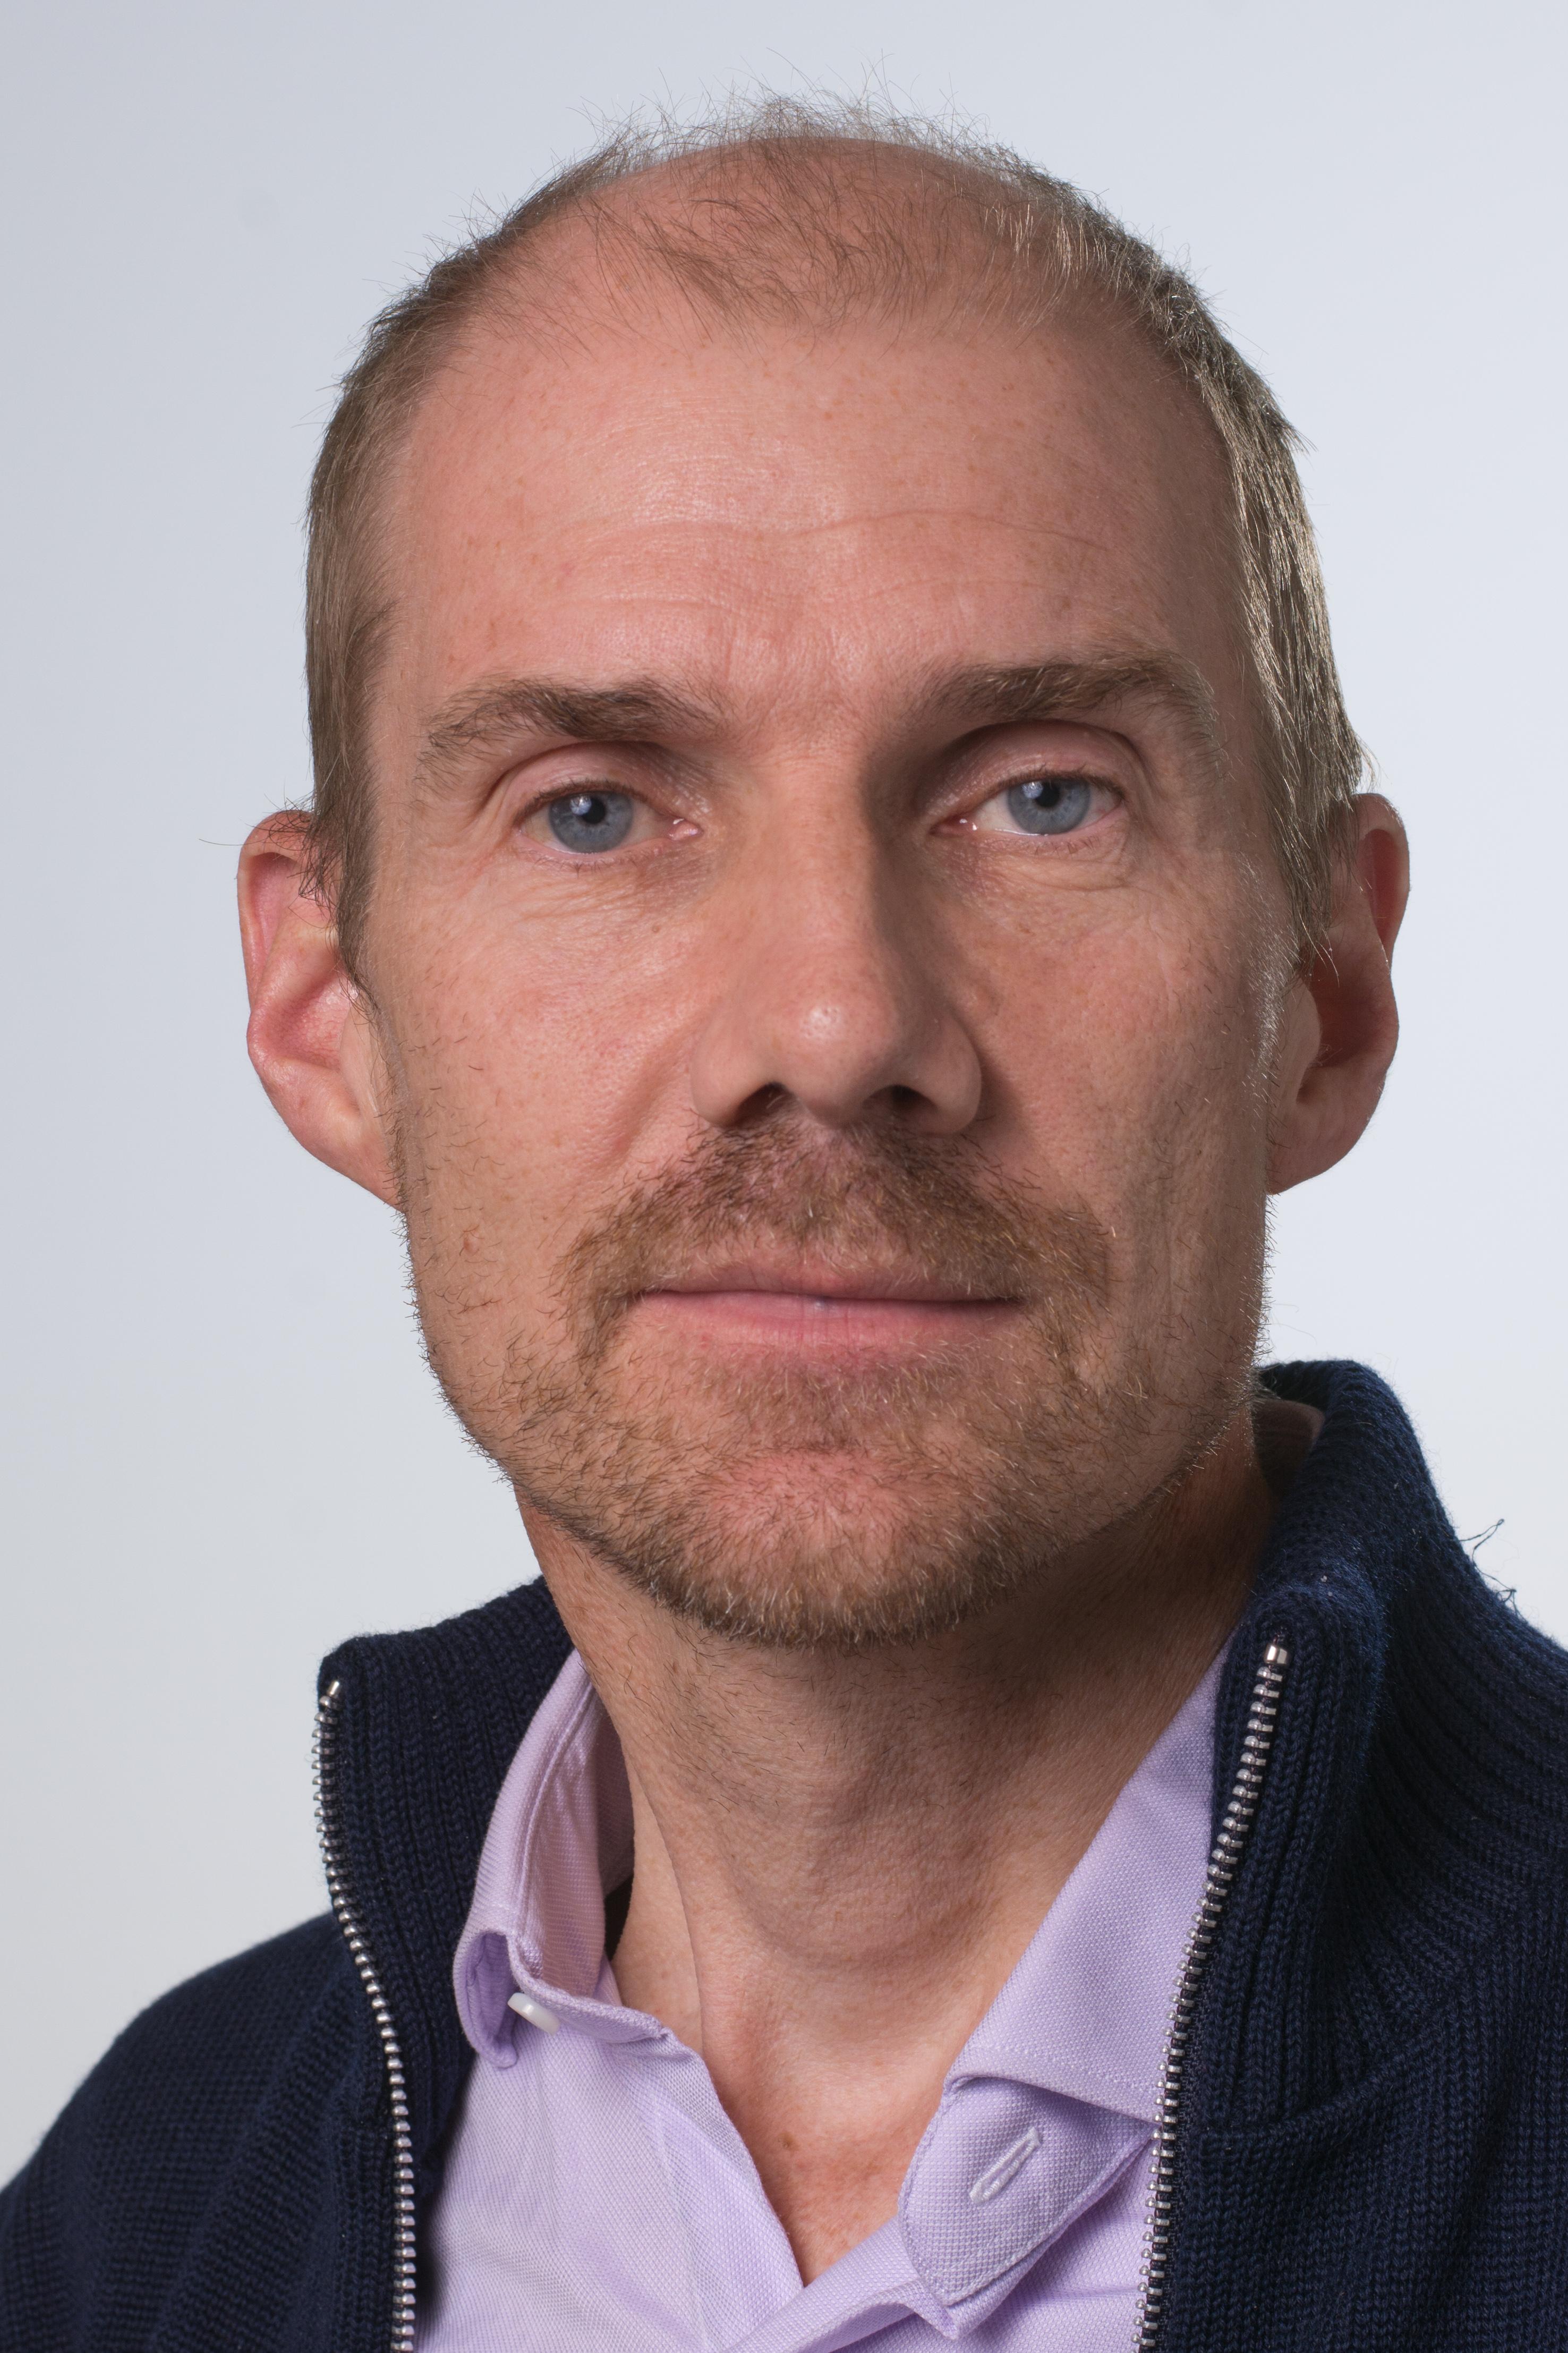 Claus Nordstrøm